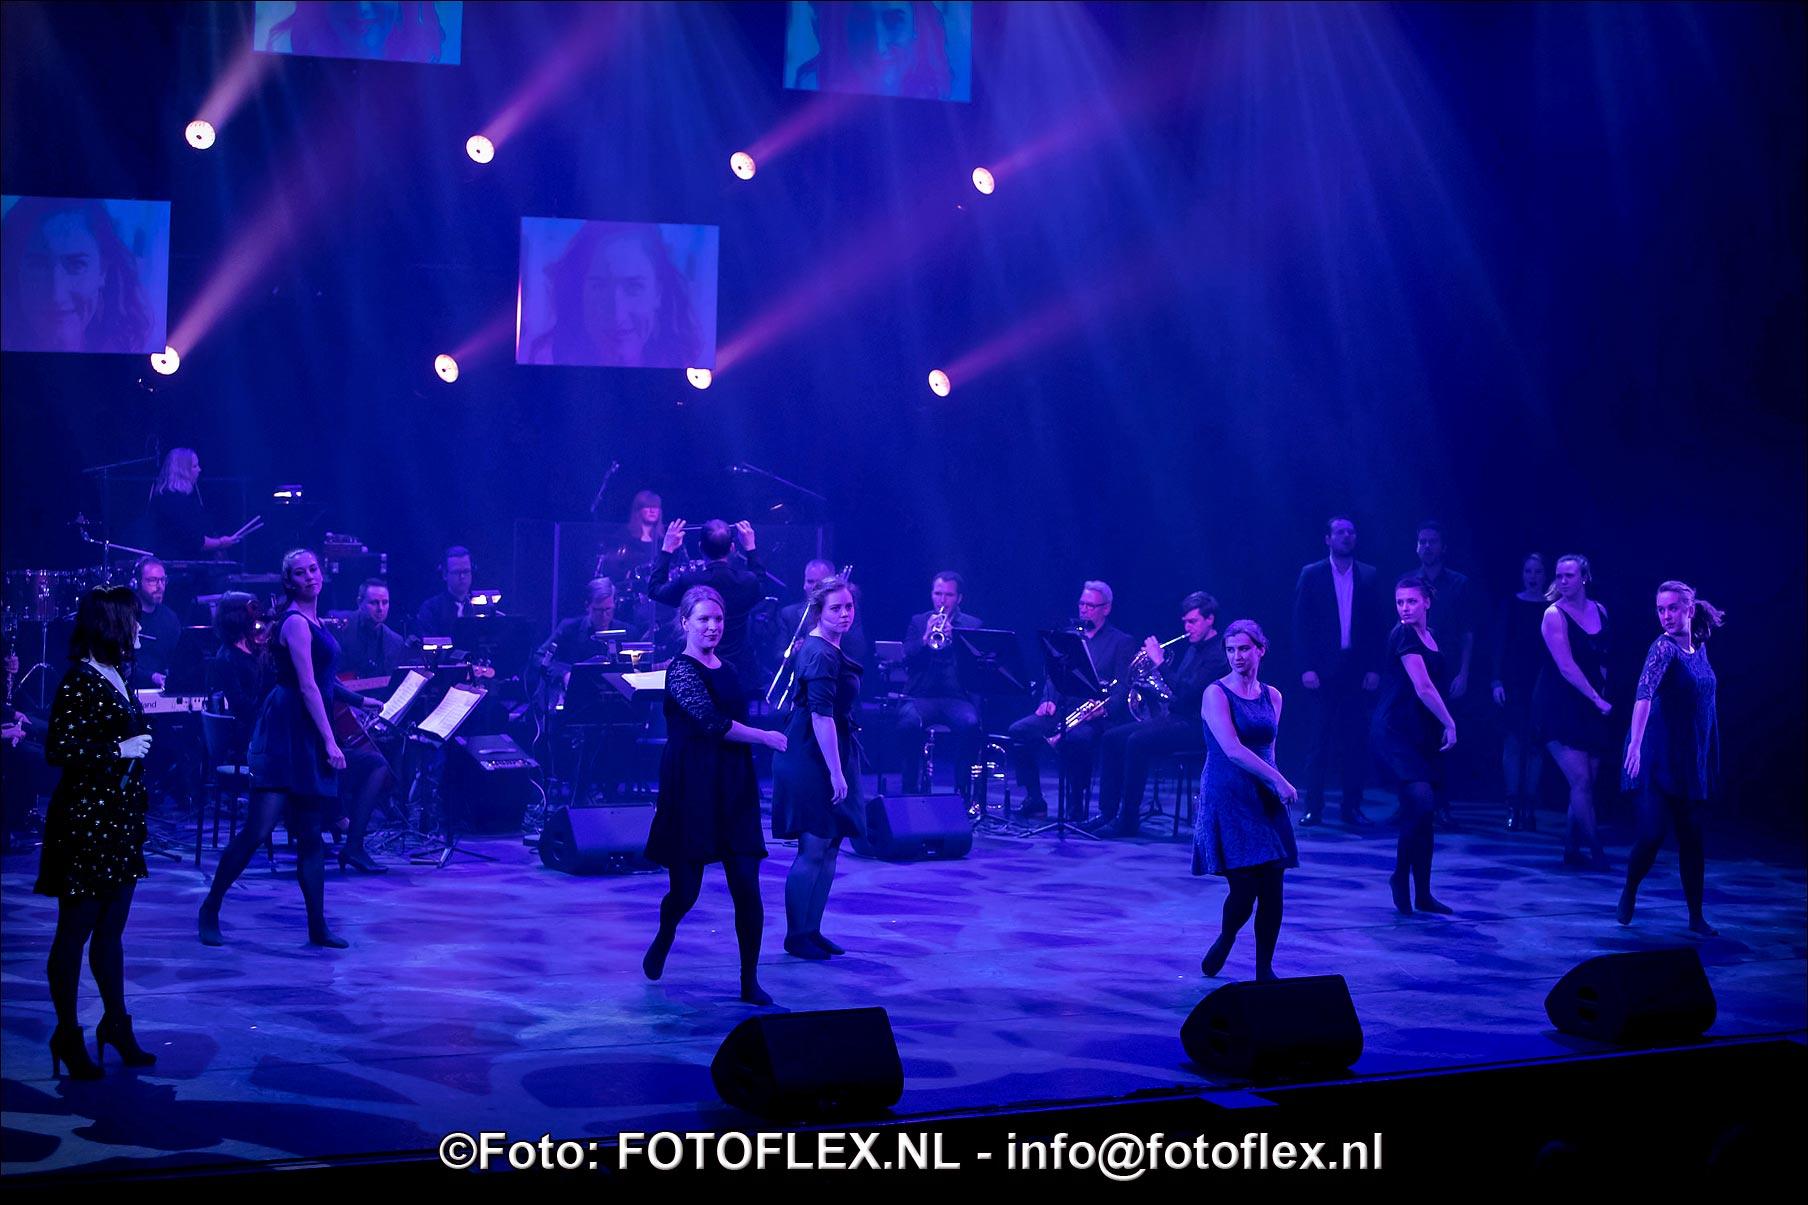 0641-CopyrightFOTOFLEX.NL07012020